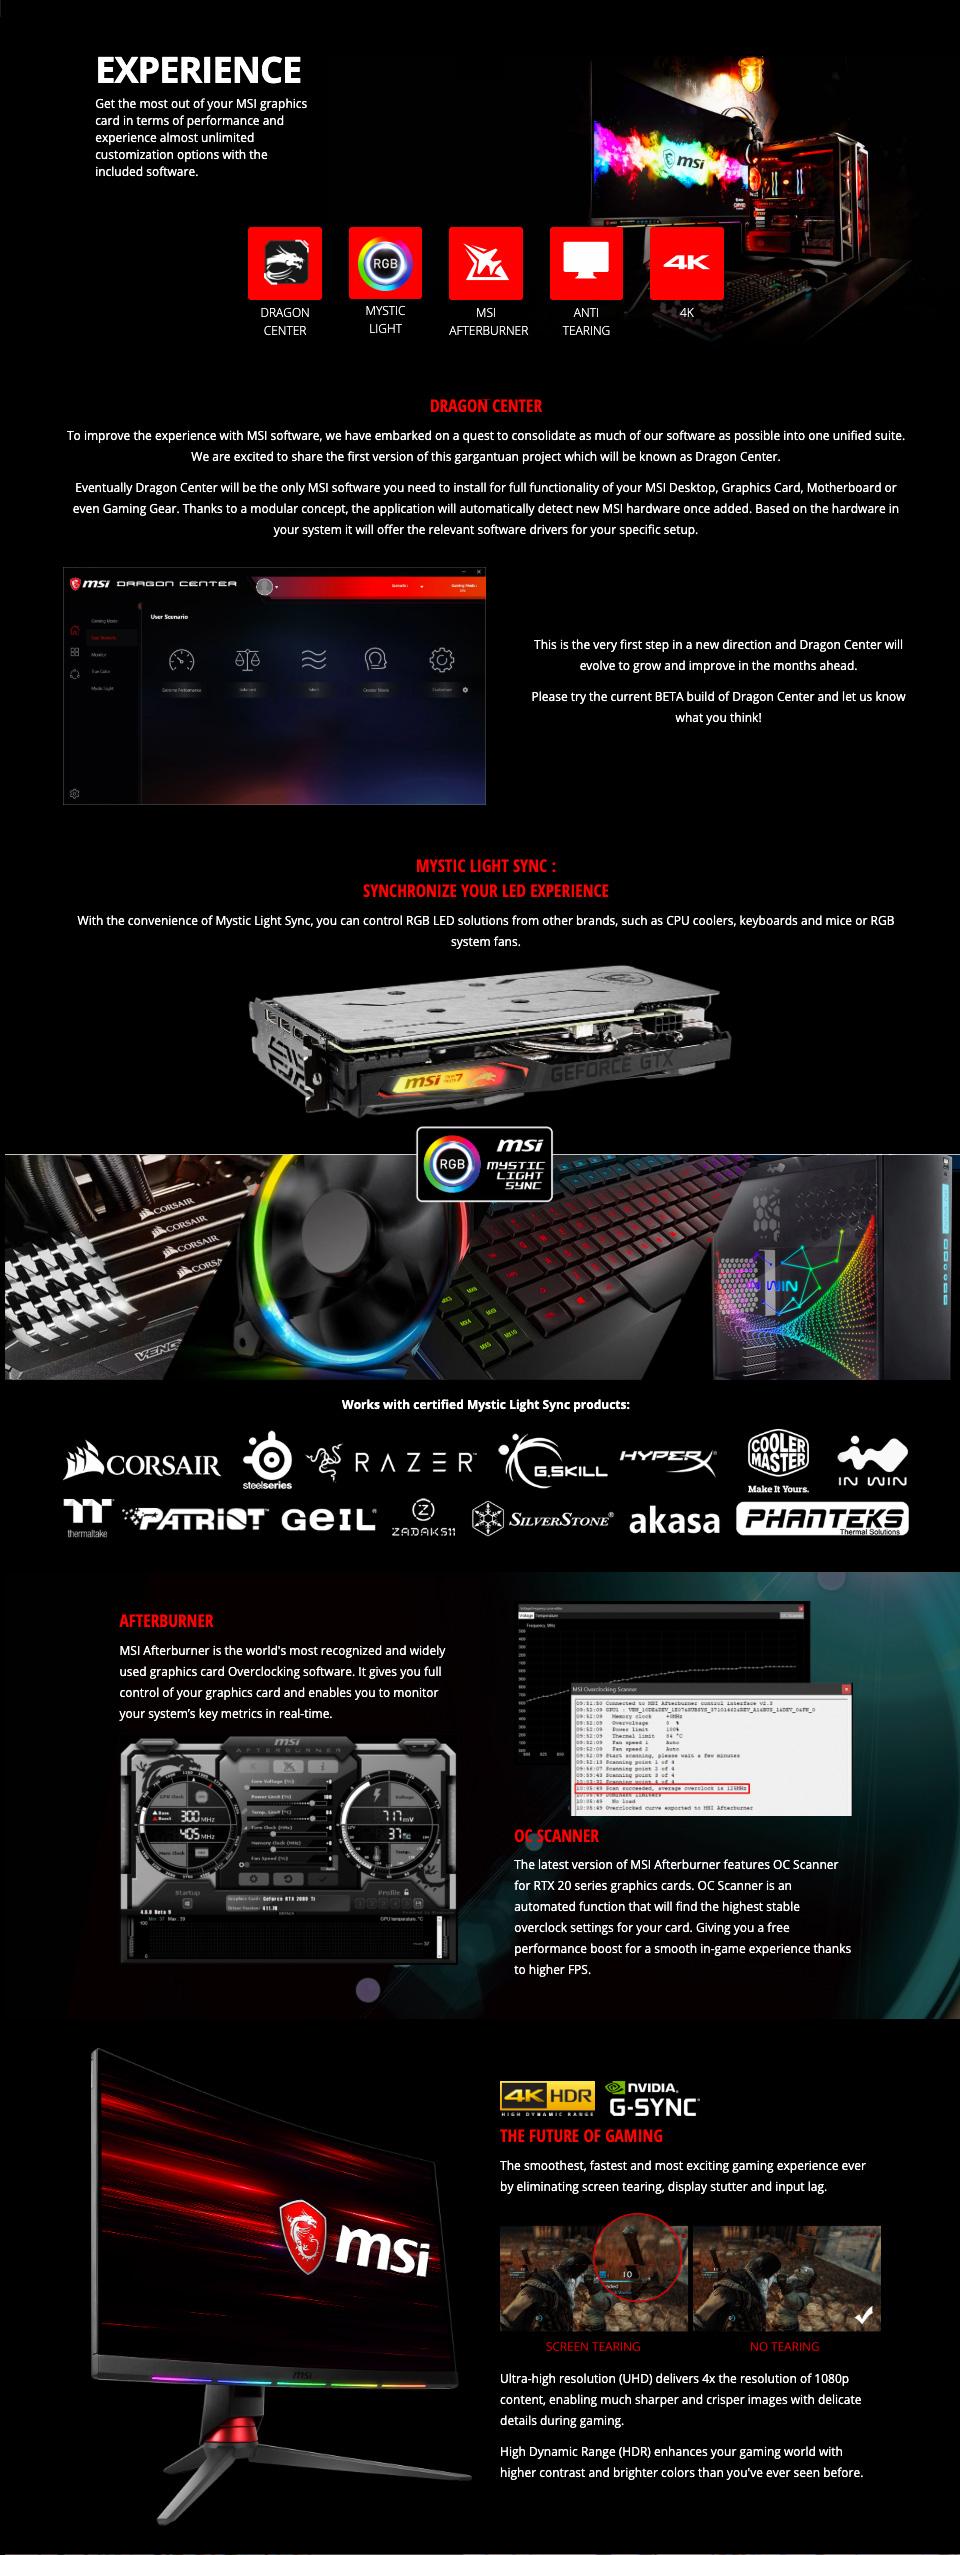 MSI GeForce GTX 1660 Super Gaming X 6GB features 5